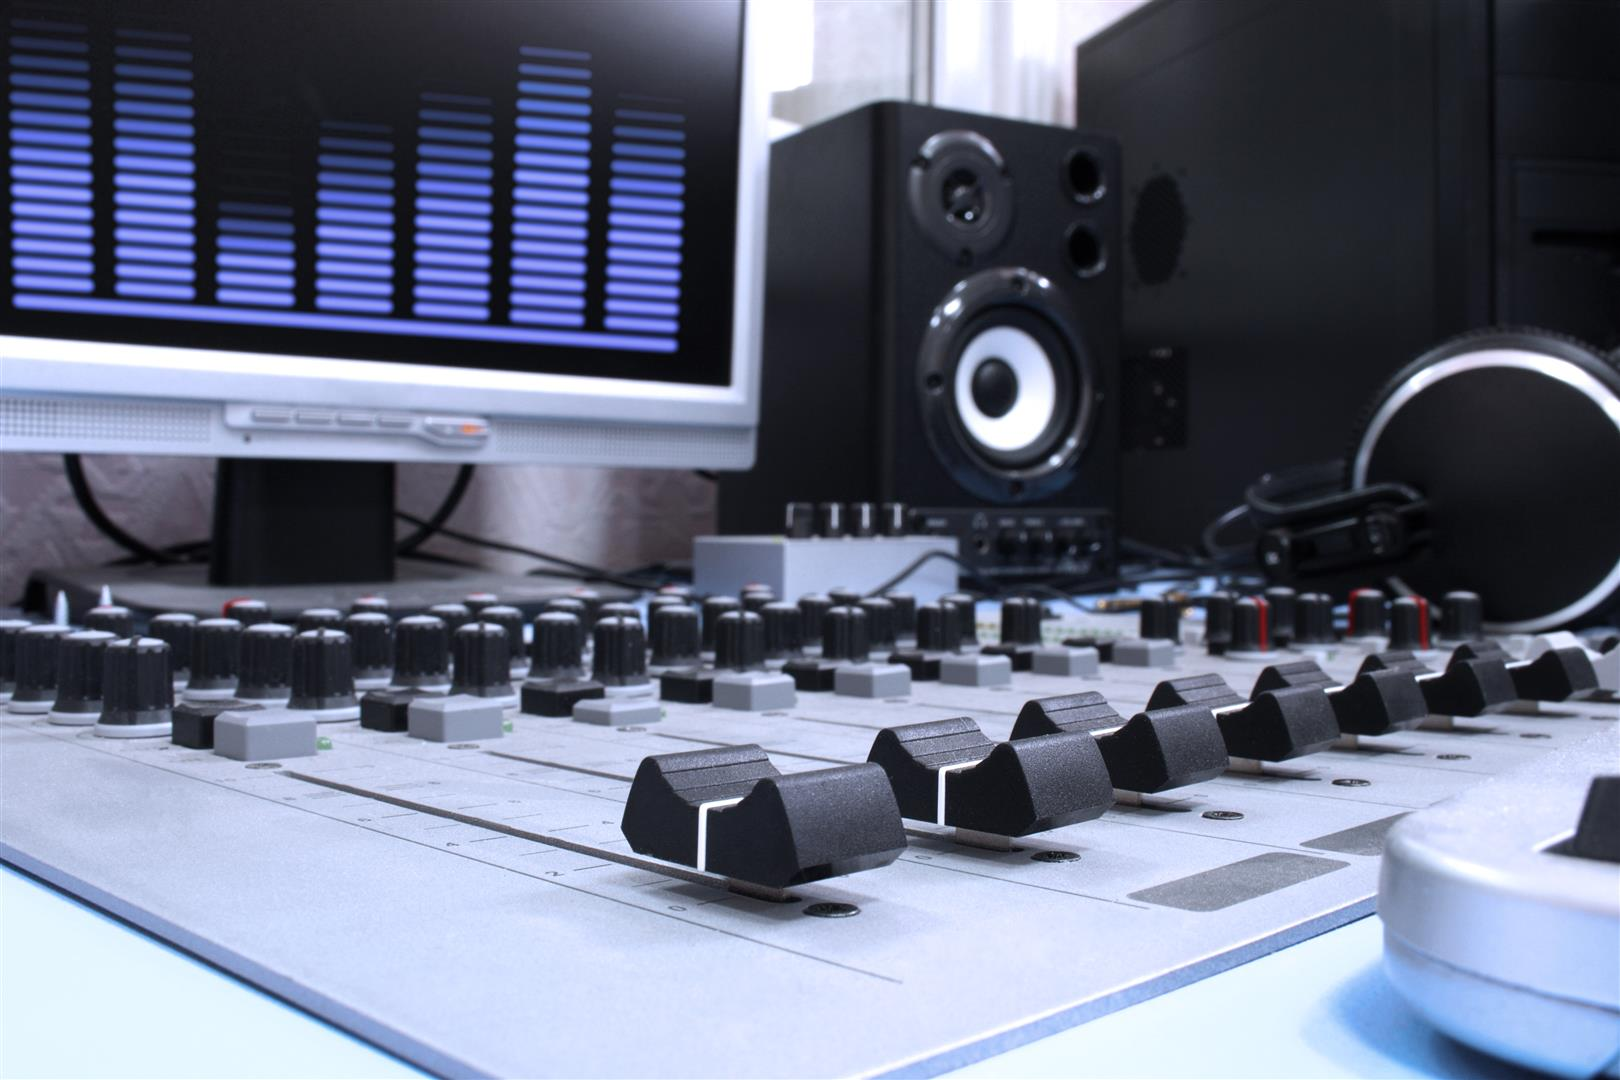 Кружок Аудио - видео записи